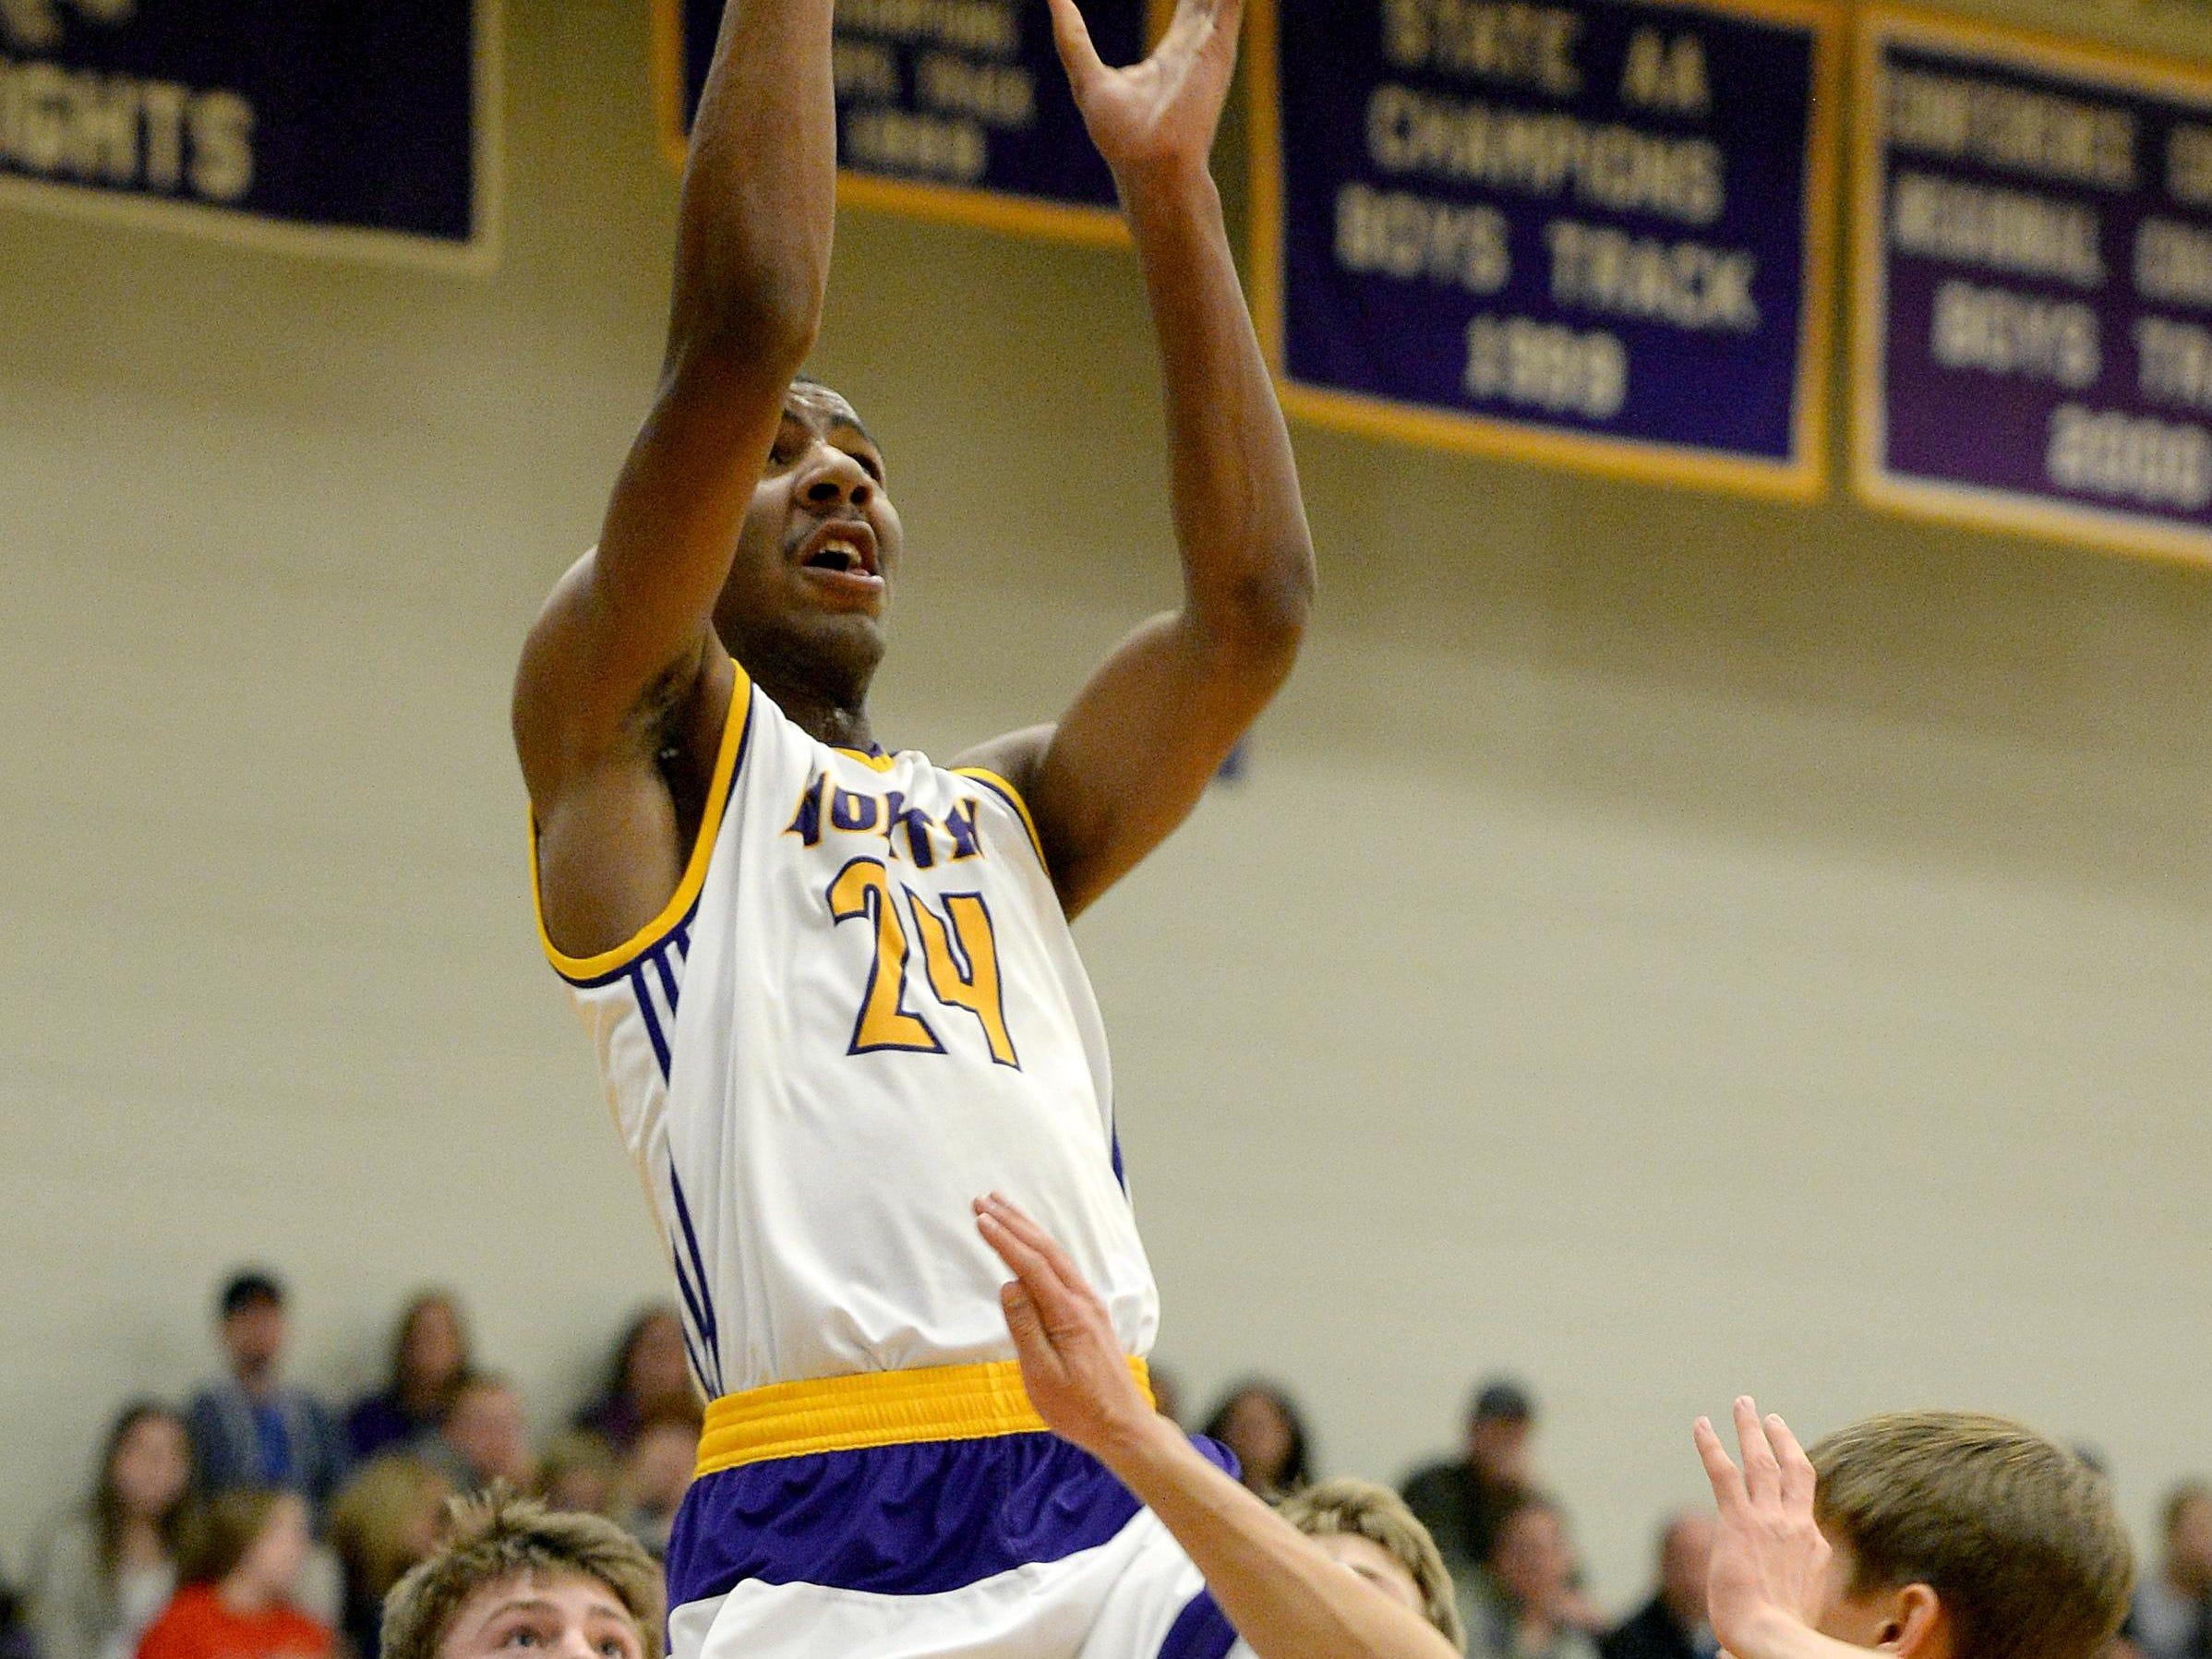 Austin Nelson is the leading scorer for the 13-0 North Henderson basketball team.